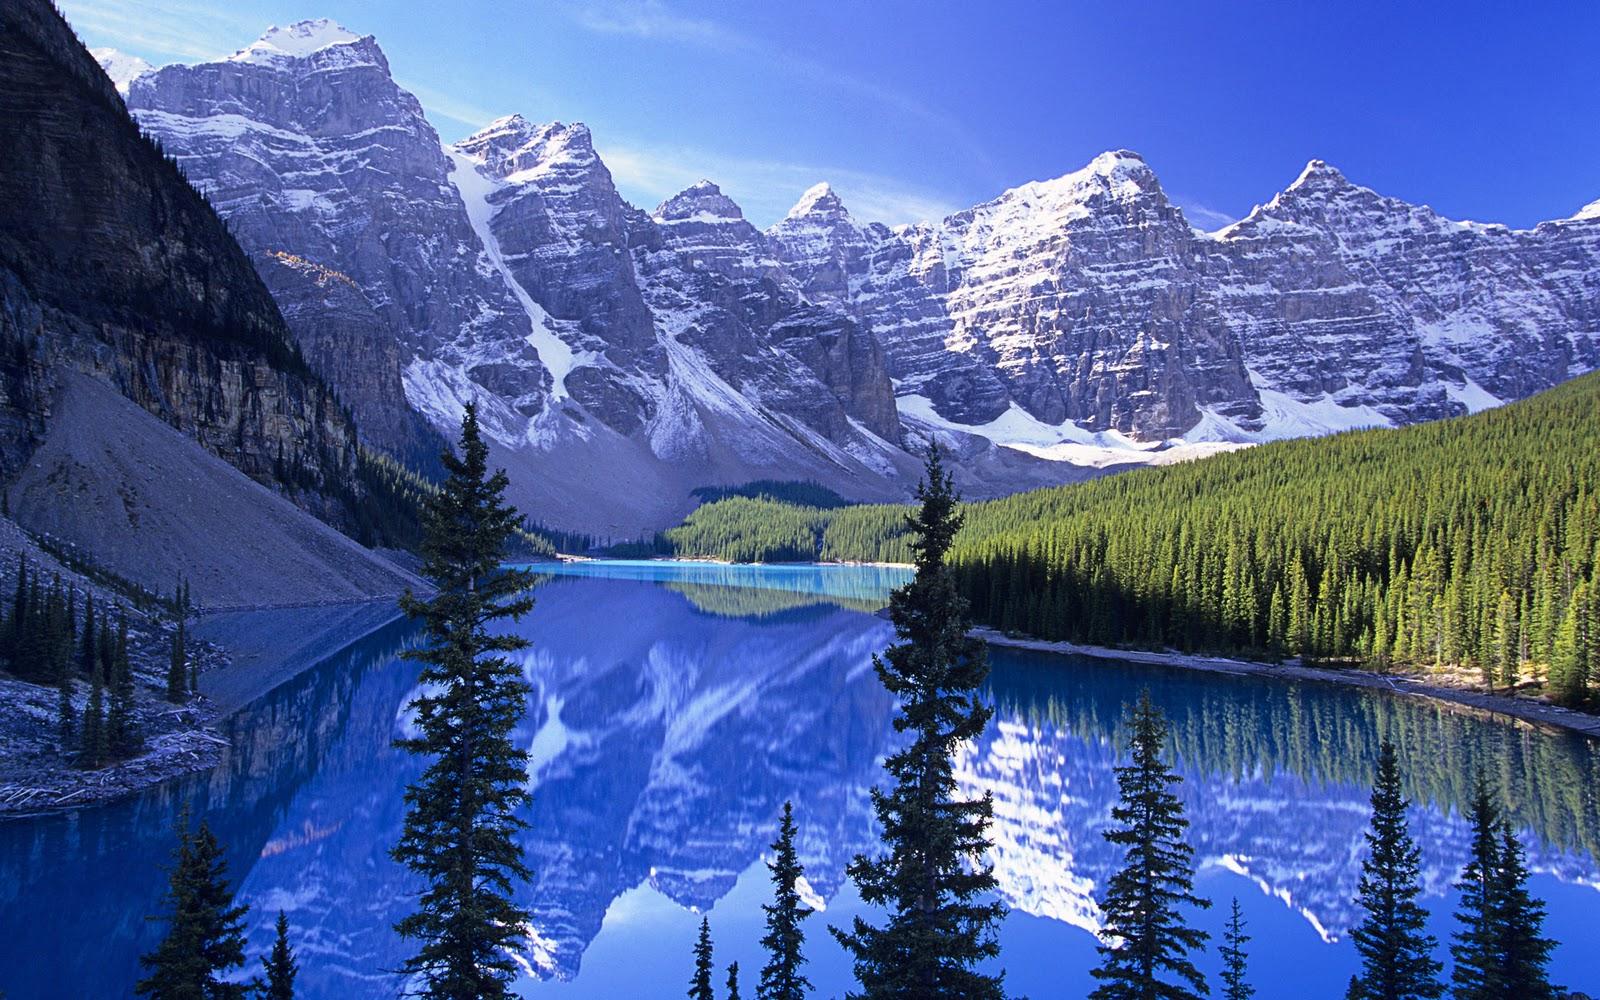 Download Wallpaper Mountain Windows Vista - Mountain-HD-Wallpaper  Image_676867.jpg